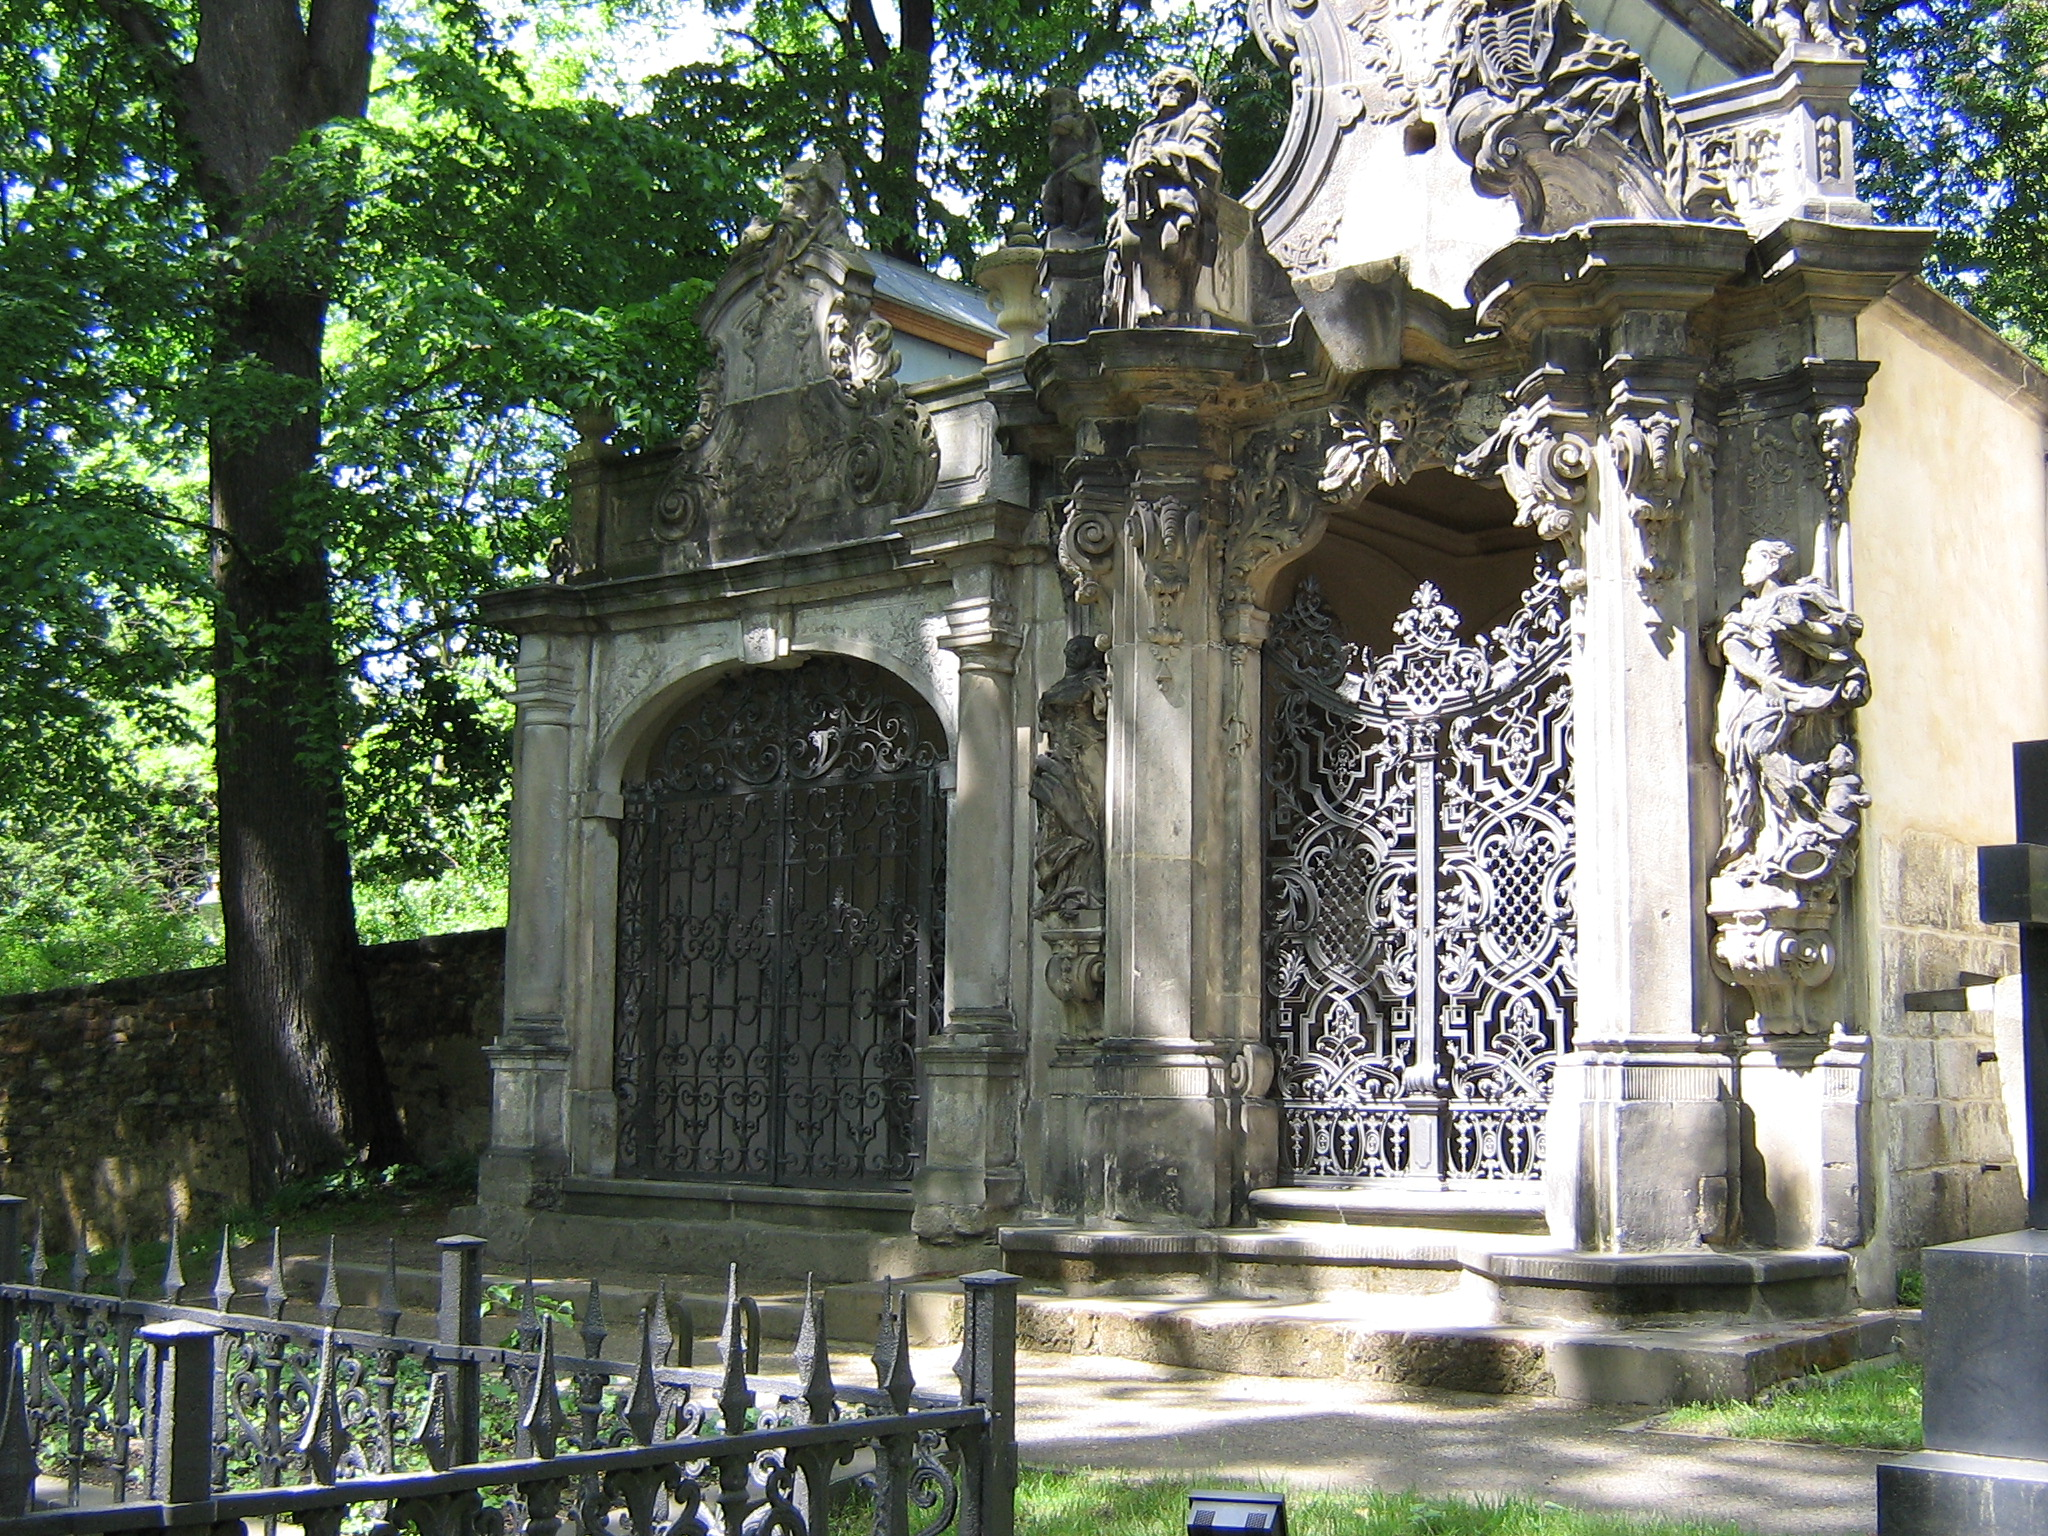 Mausoleum 4 by almudena-stock